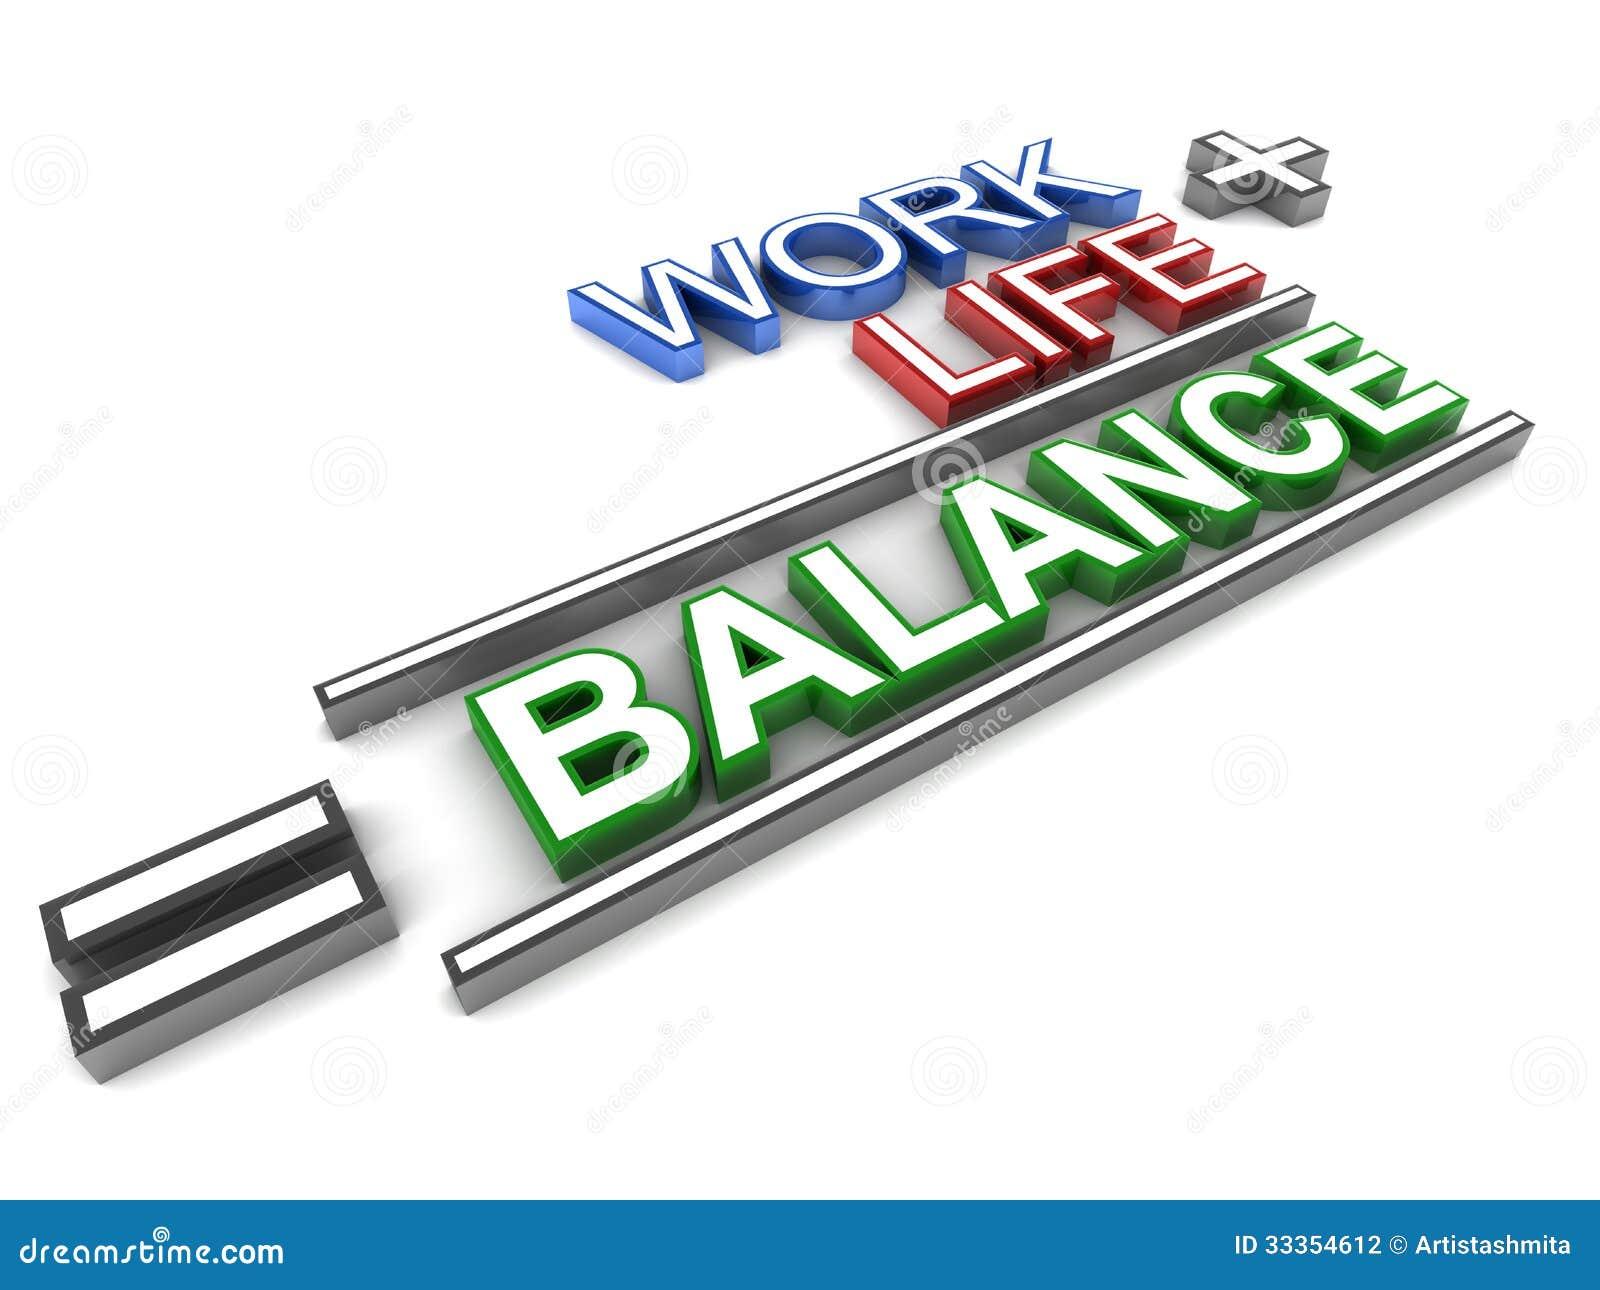 work less live more pdf